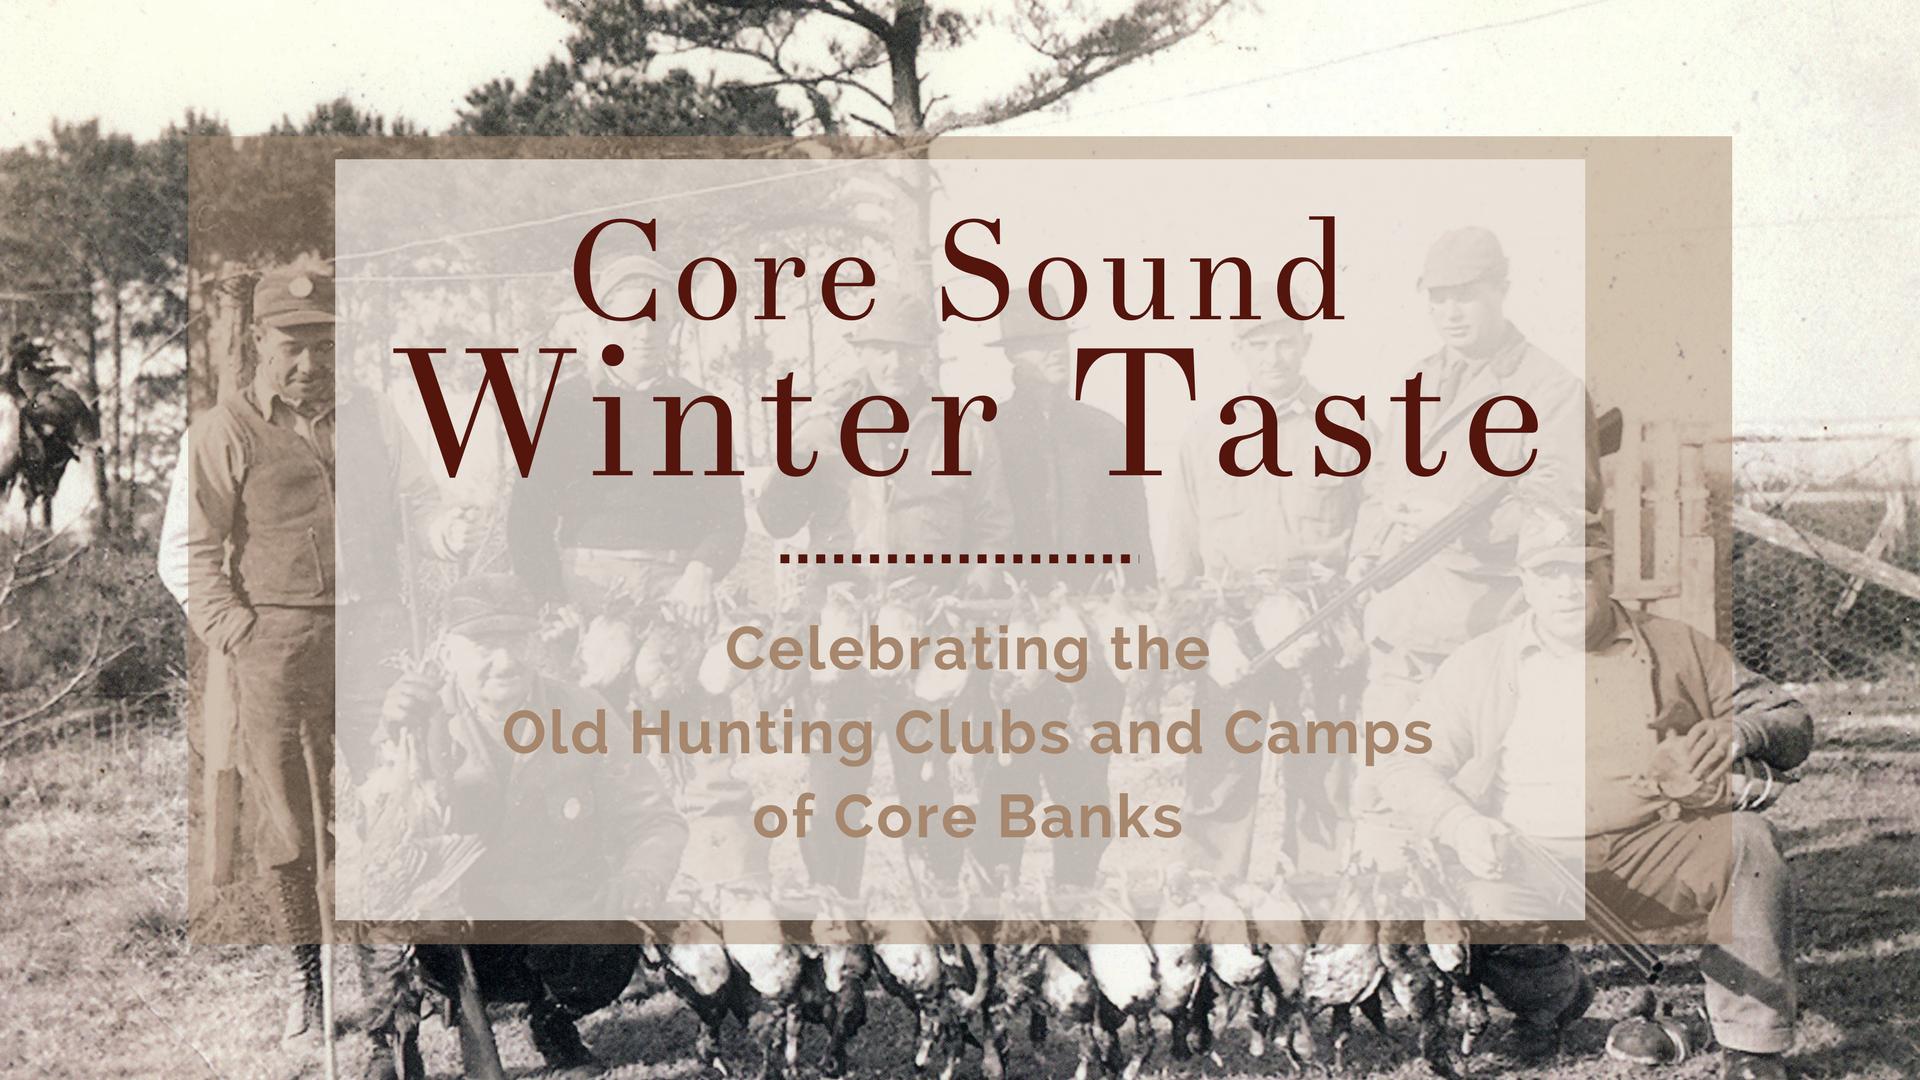 Winter Taste